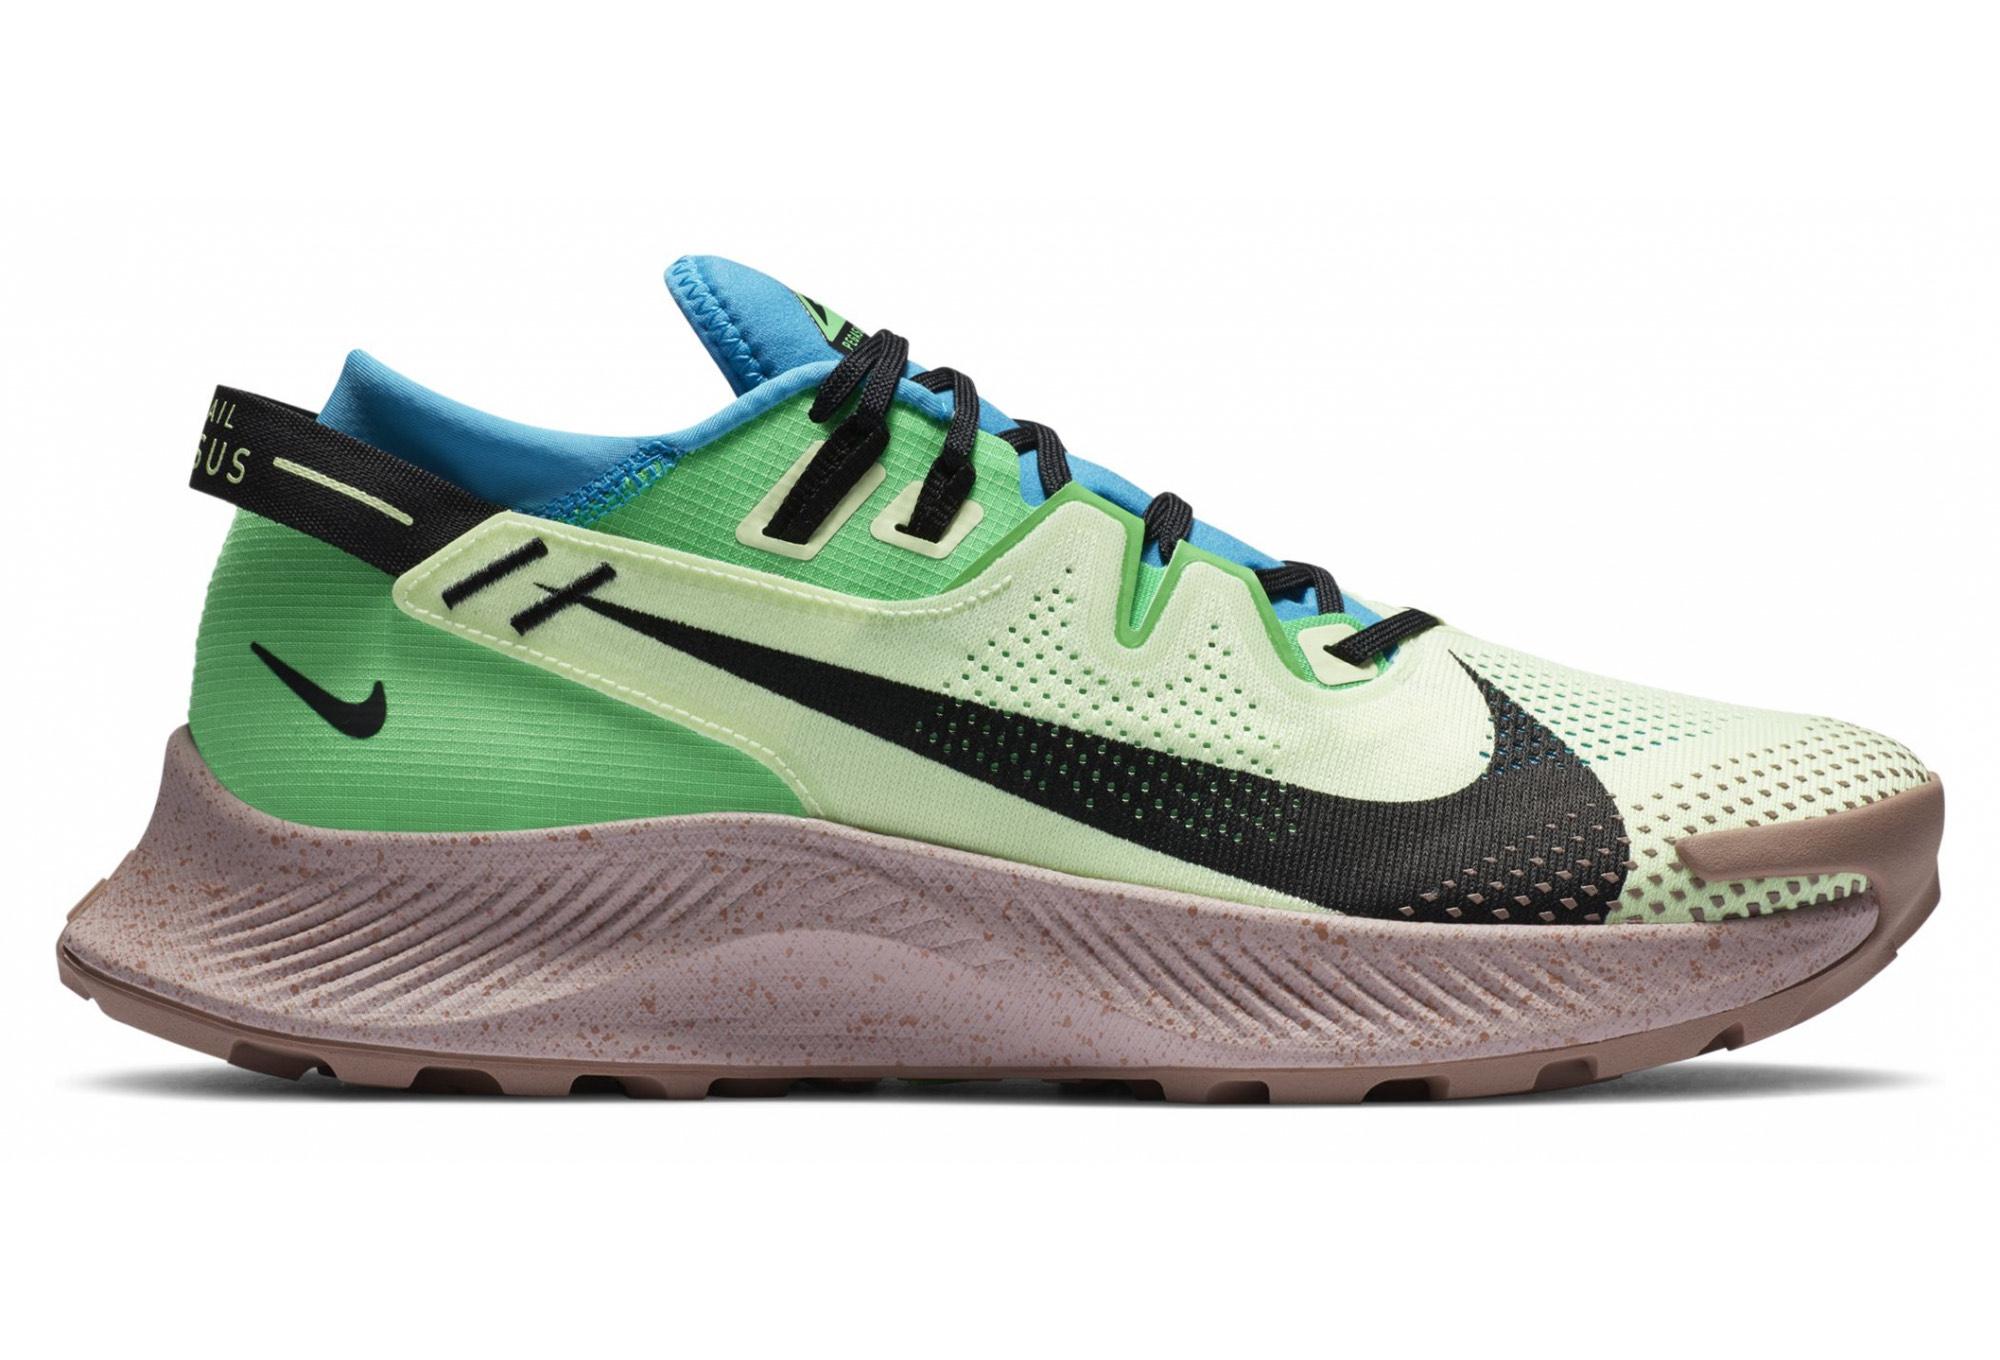 Chaussures de Trail Nike Pegasus Trail 2 - Vert / Bleu / Marron